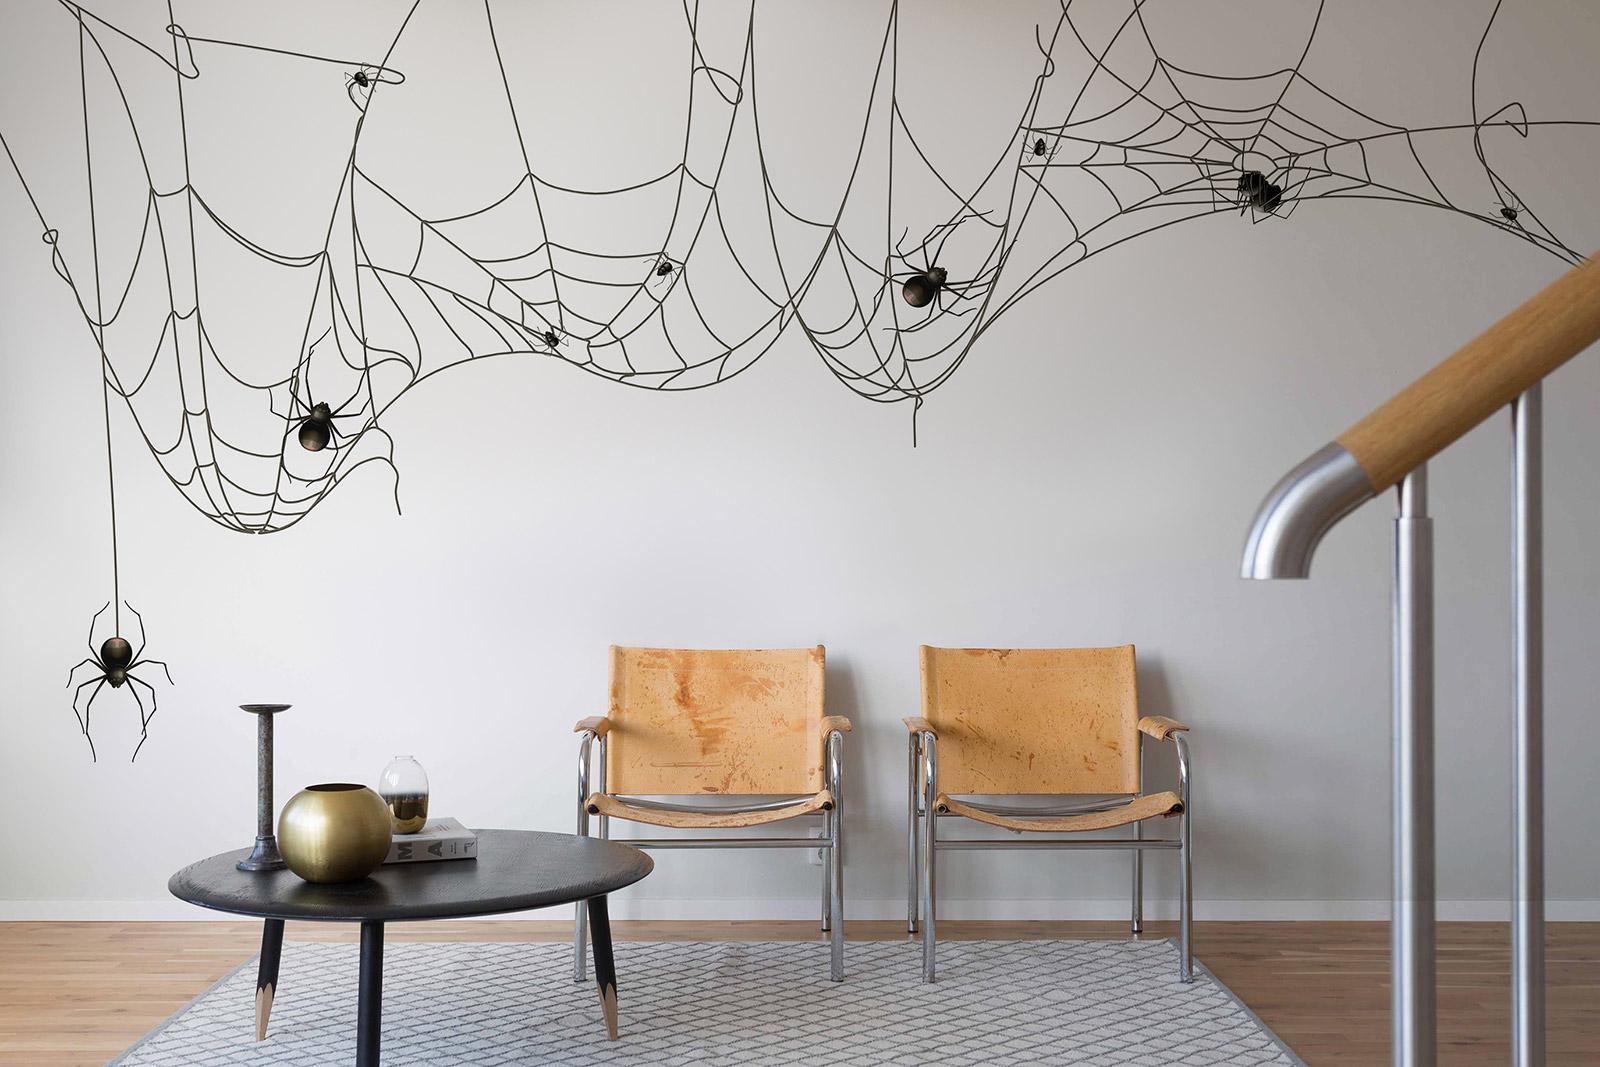 Wall Decor Halloween : Mysterious cool halloween removable wall decor